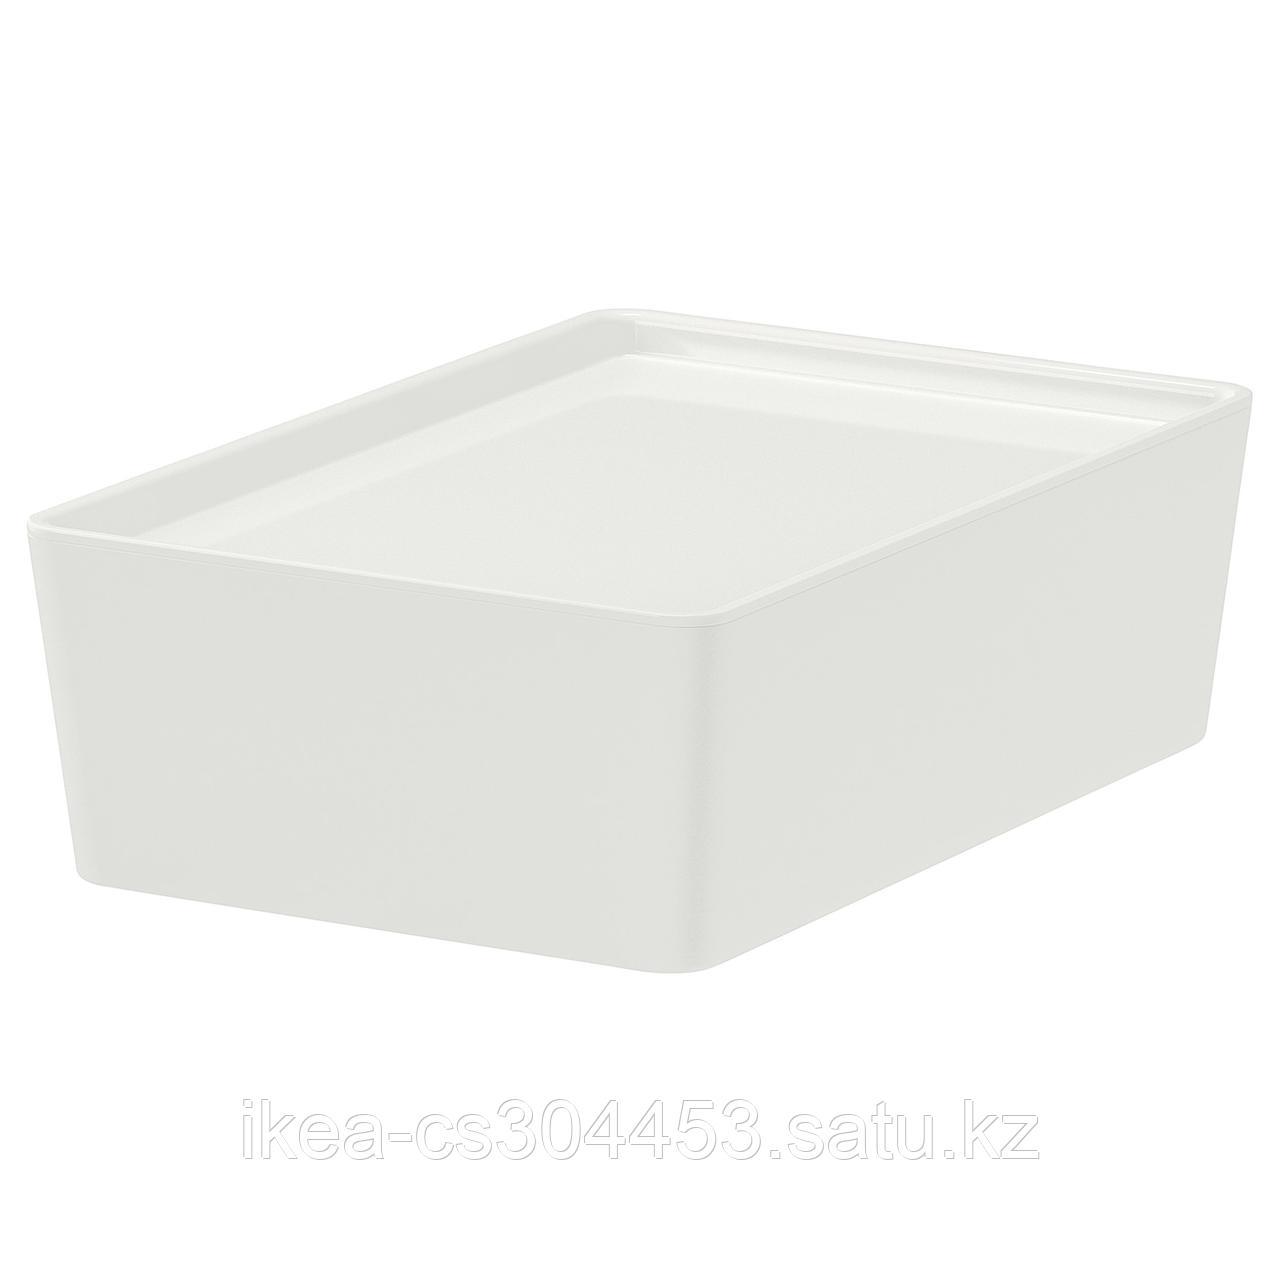 Коробки для бумаг и дисков